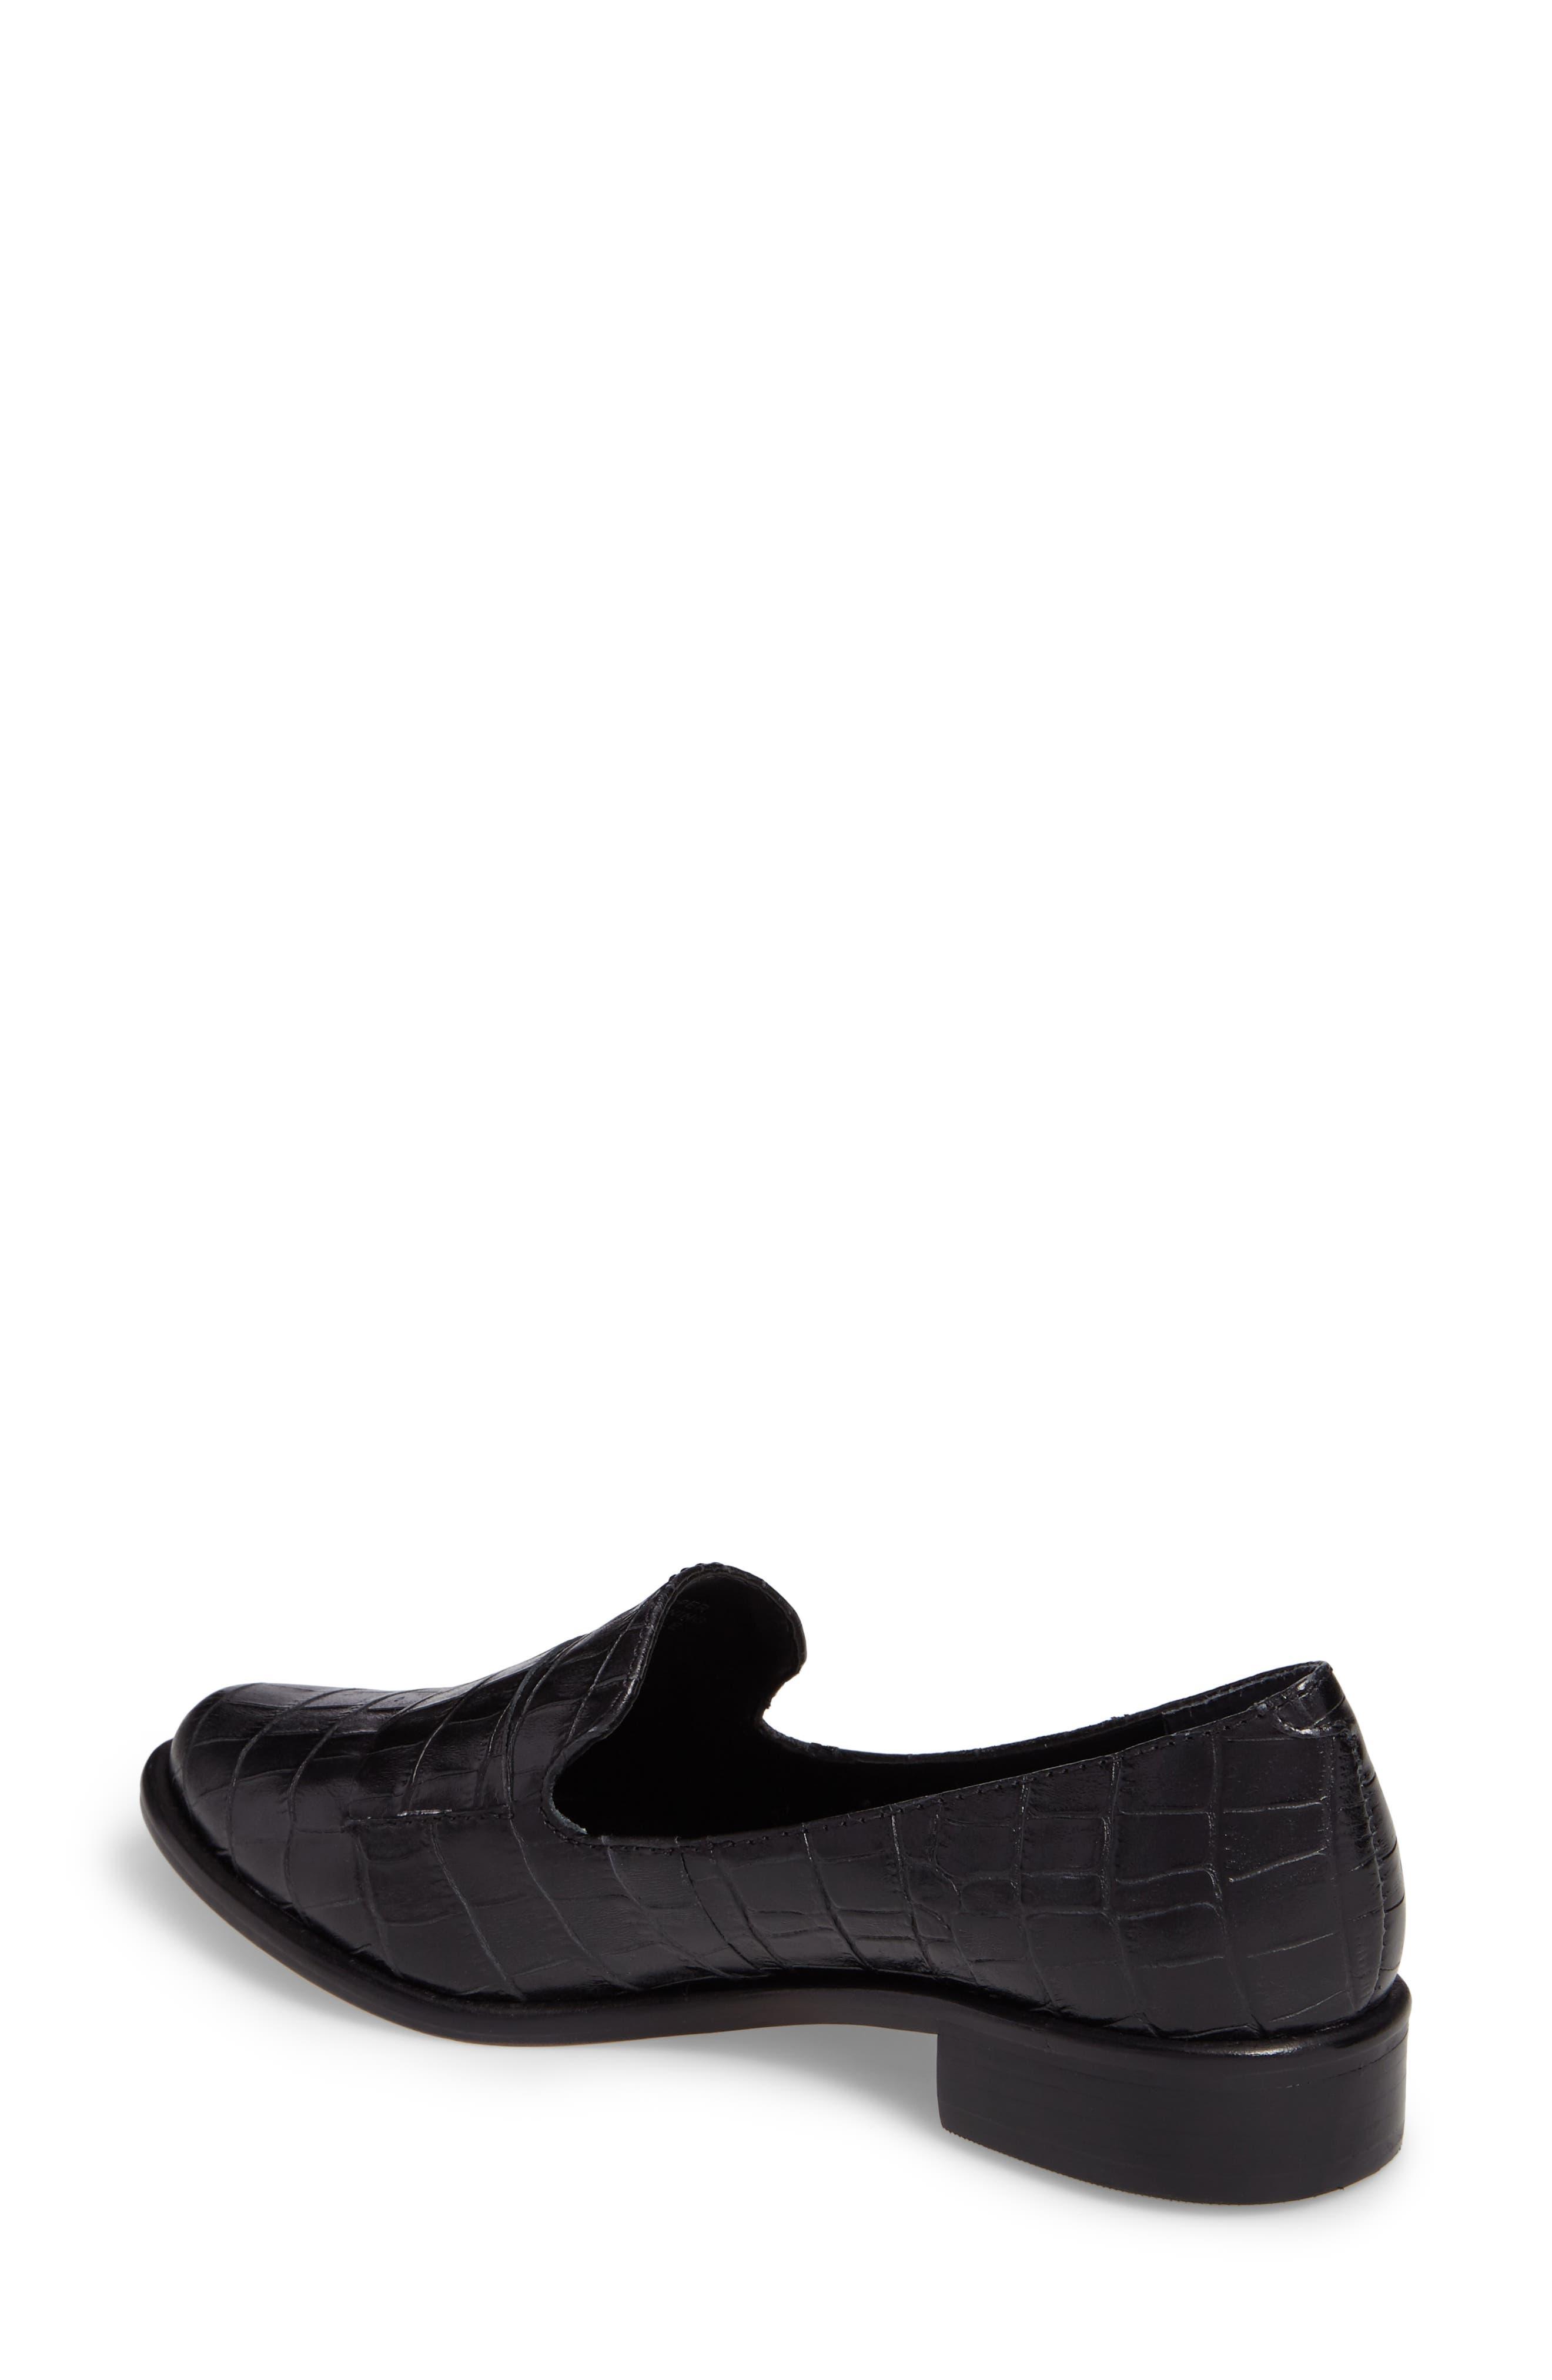 M4D3 'Ocean' Flat Loafer,                             Alternate thumbnail 9, color,